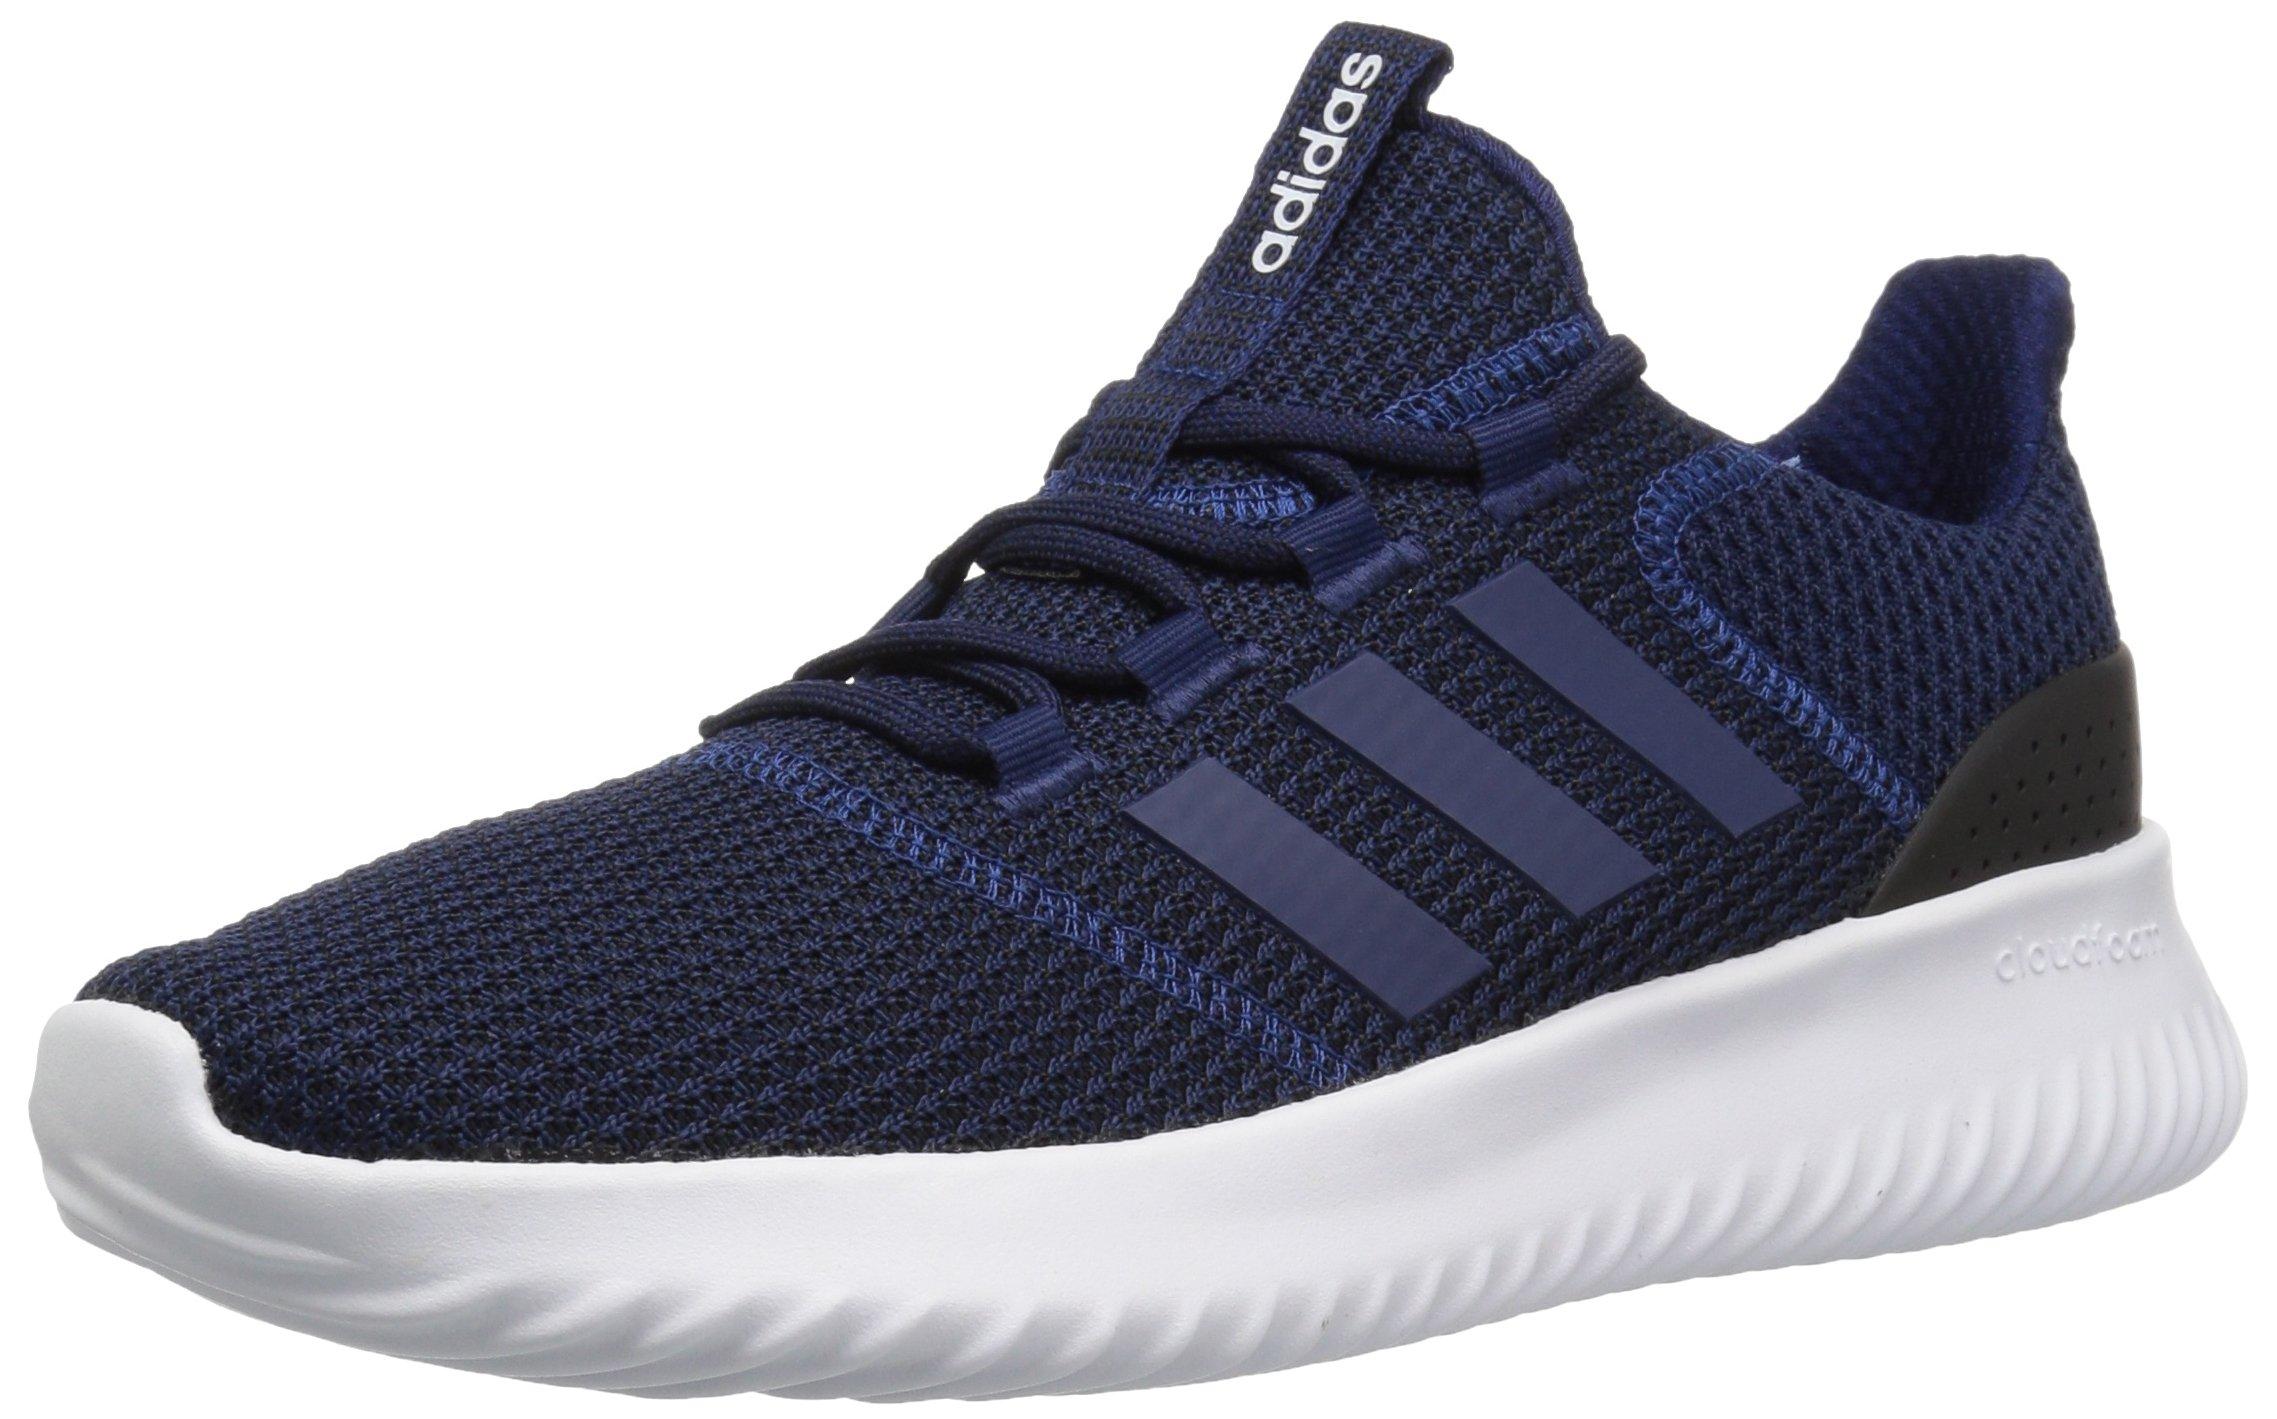 adidas Men's Cloudfoam Ultimate Running Shoe Dark Blue/Dark Blue/Black, 8.5 M US